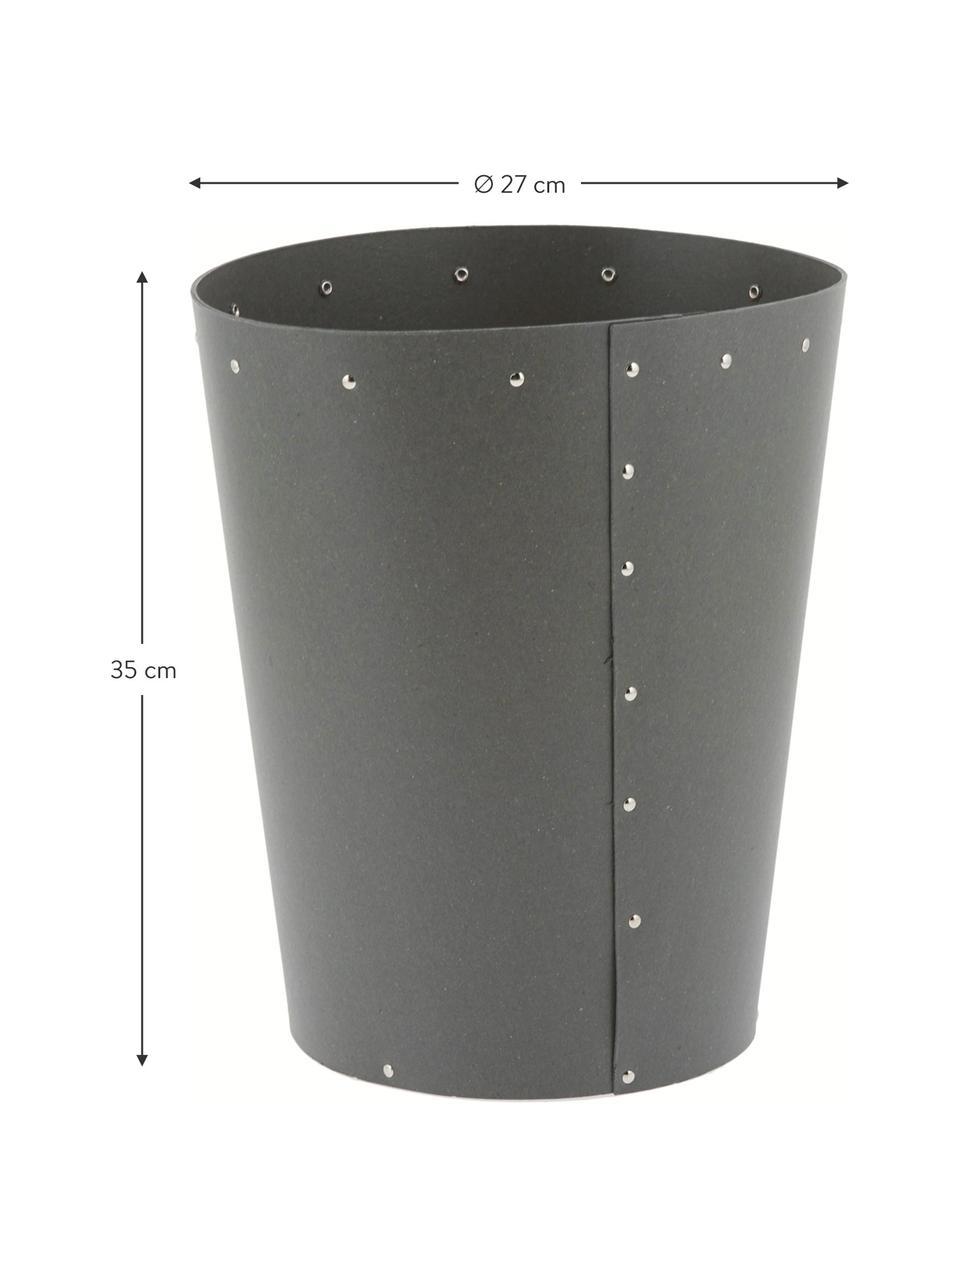 Papierkorb Aries, Fester, laminierter Karton, Grau, Silberfarben, Ø 27 x H 35 cm